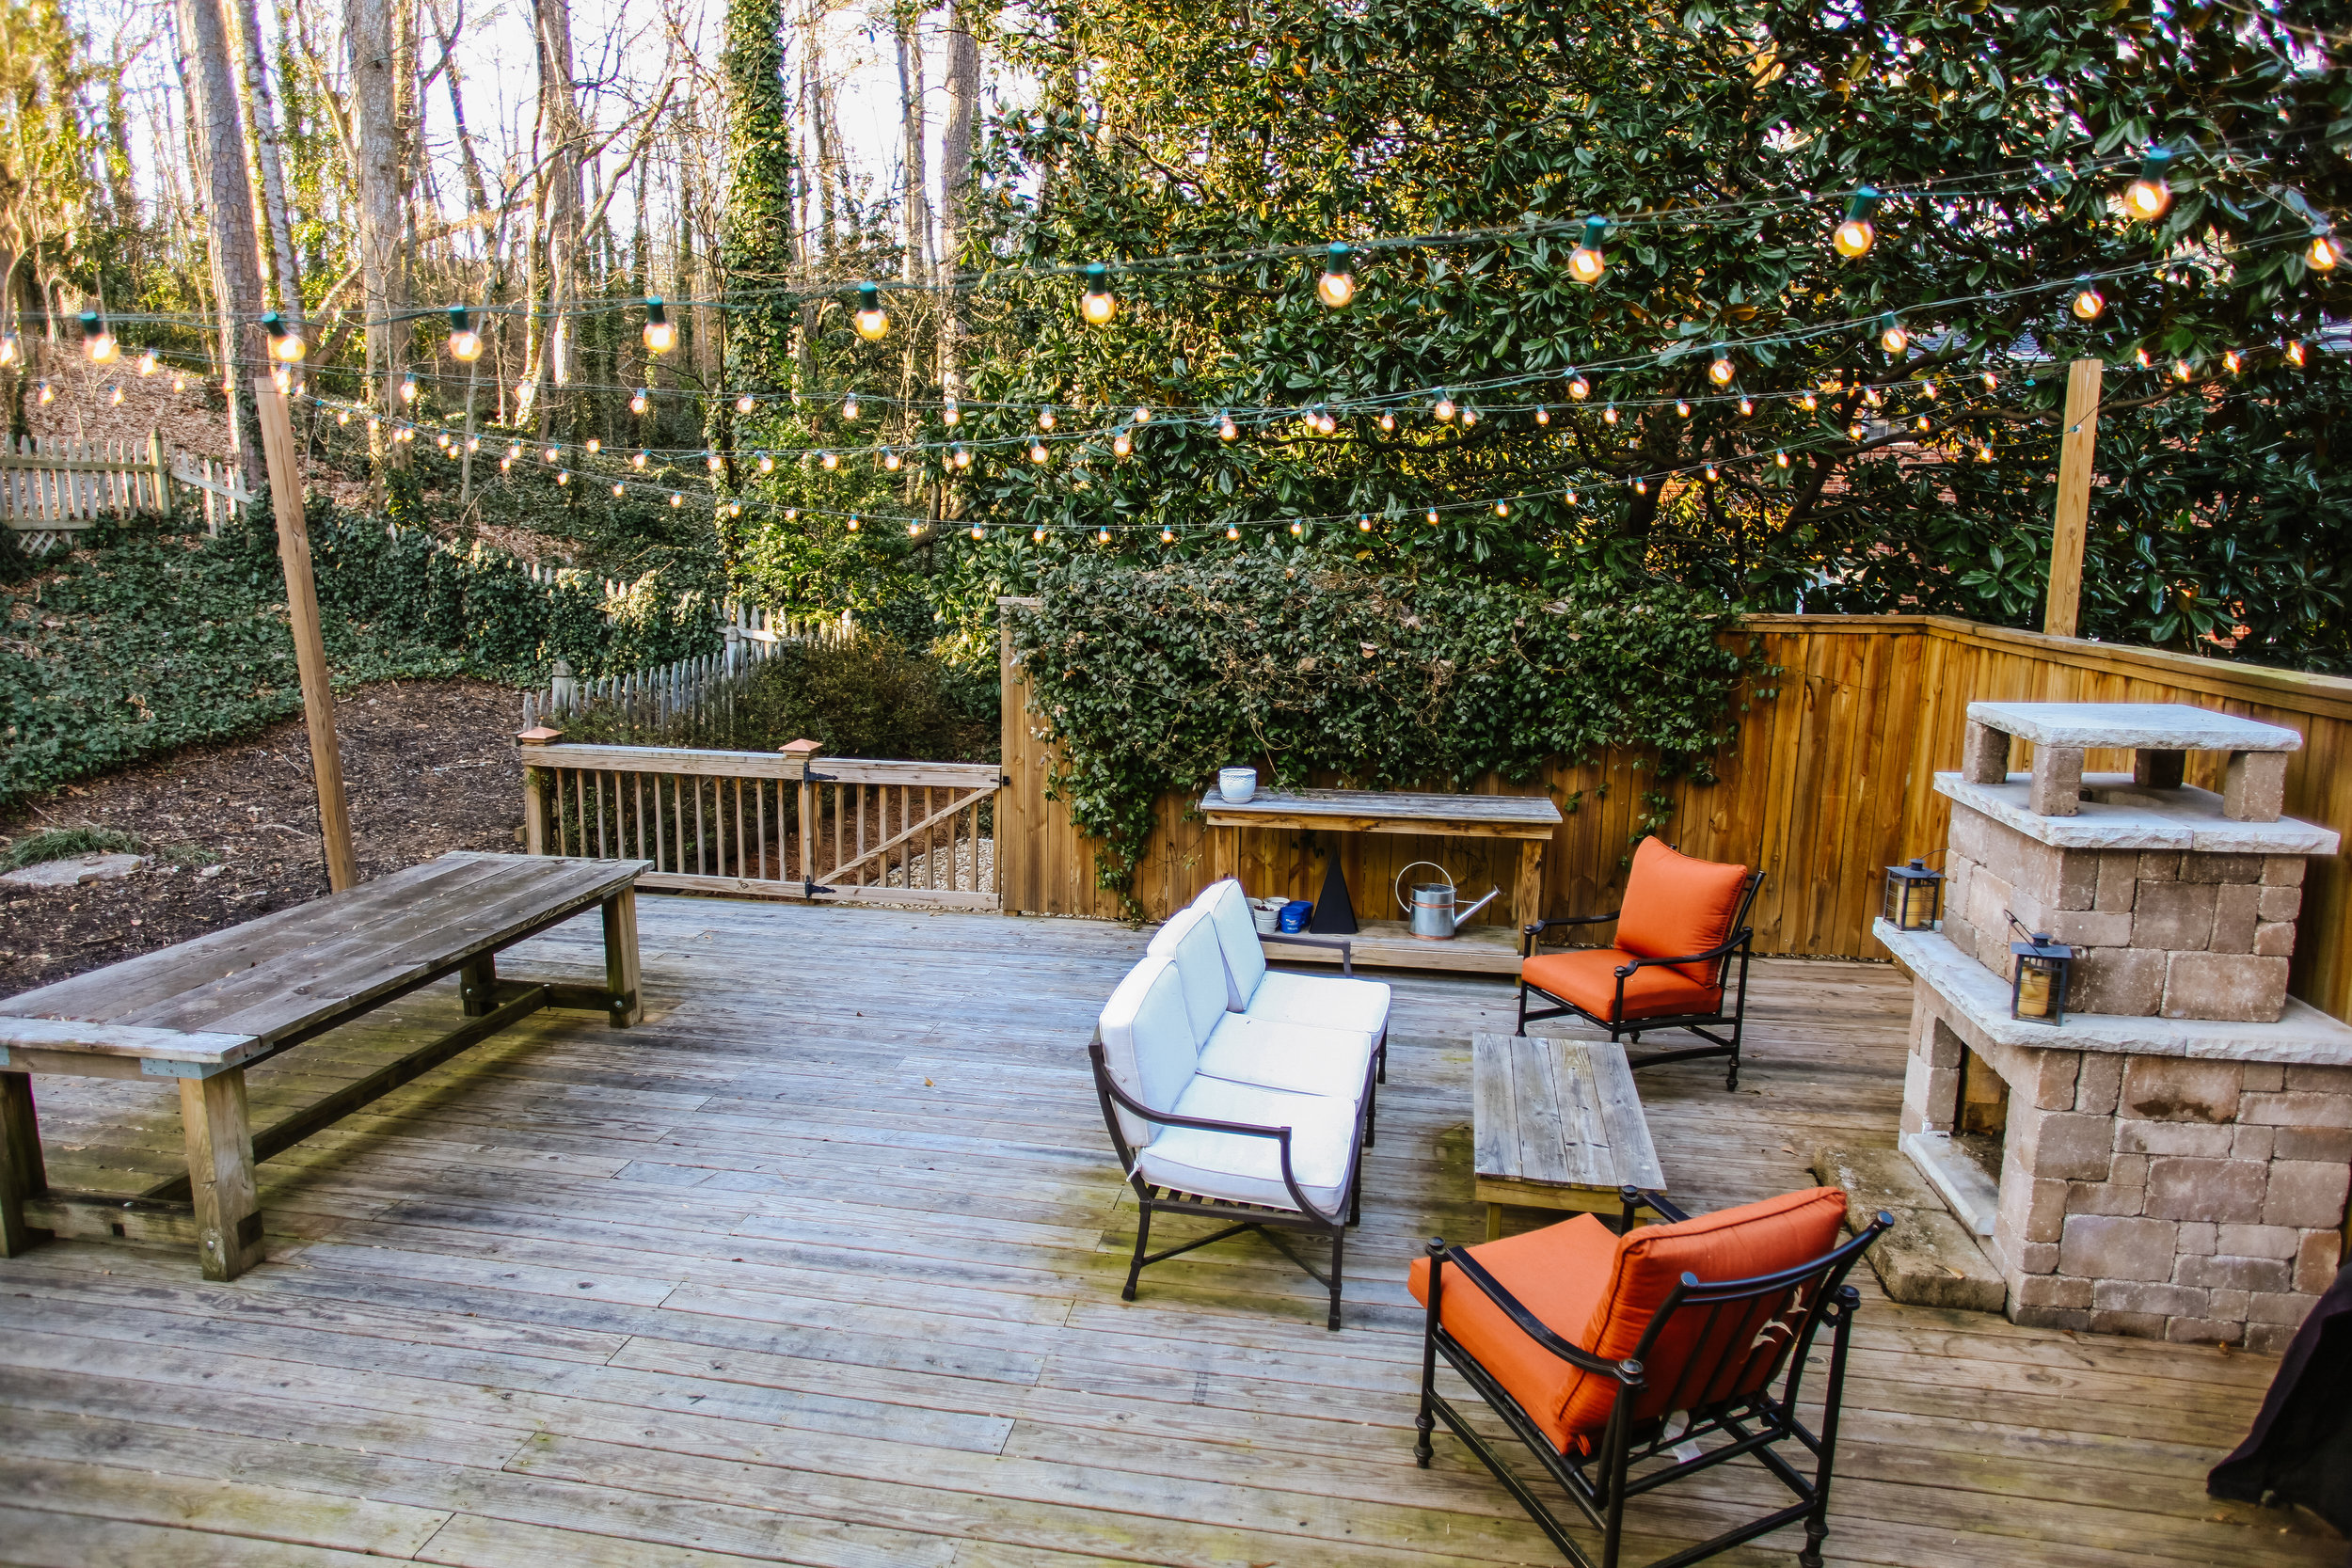 wingard-real-estate-sandy-springs-dream-home-backyard-goals-atlanta-buckhead-85.jpg